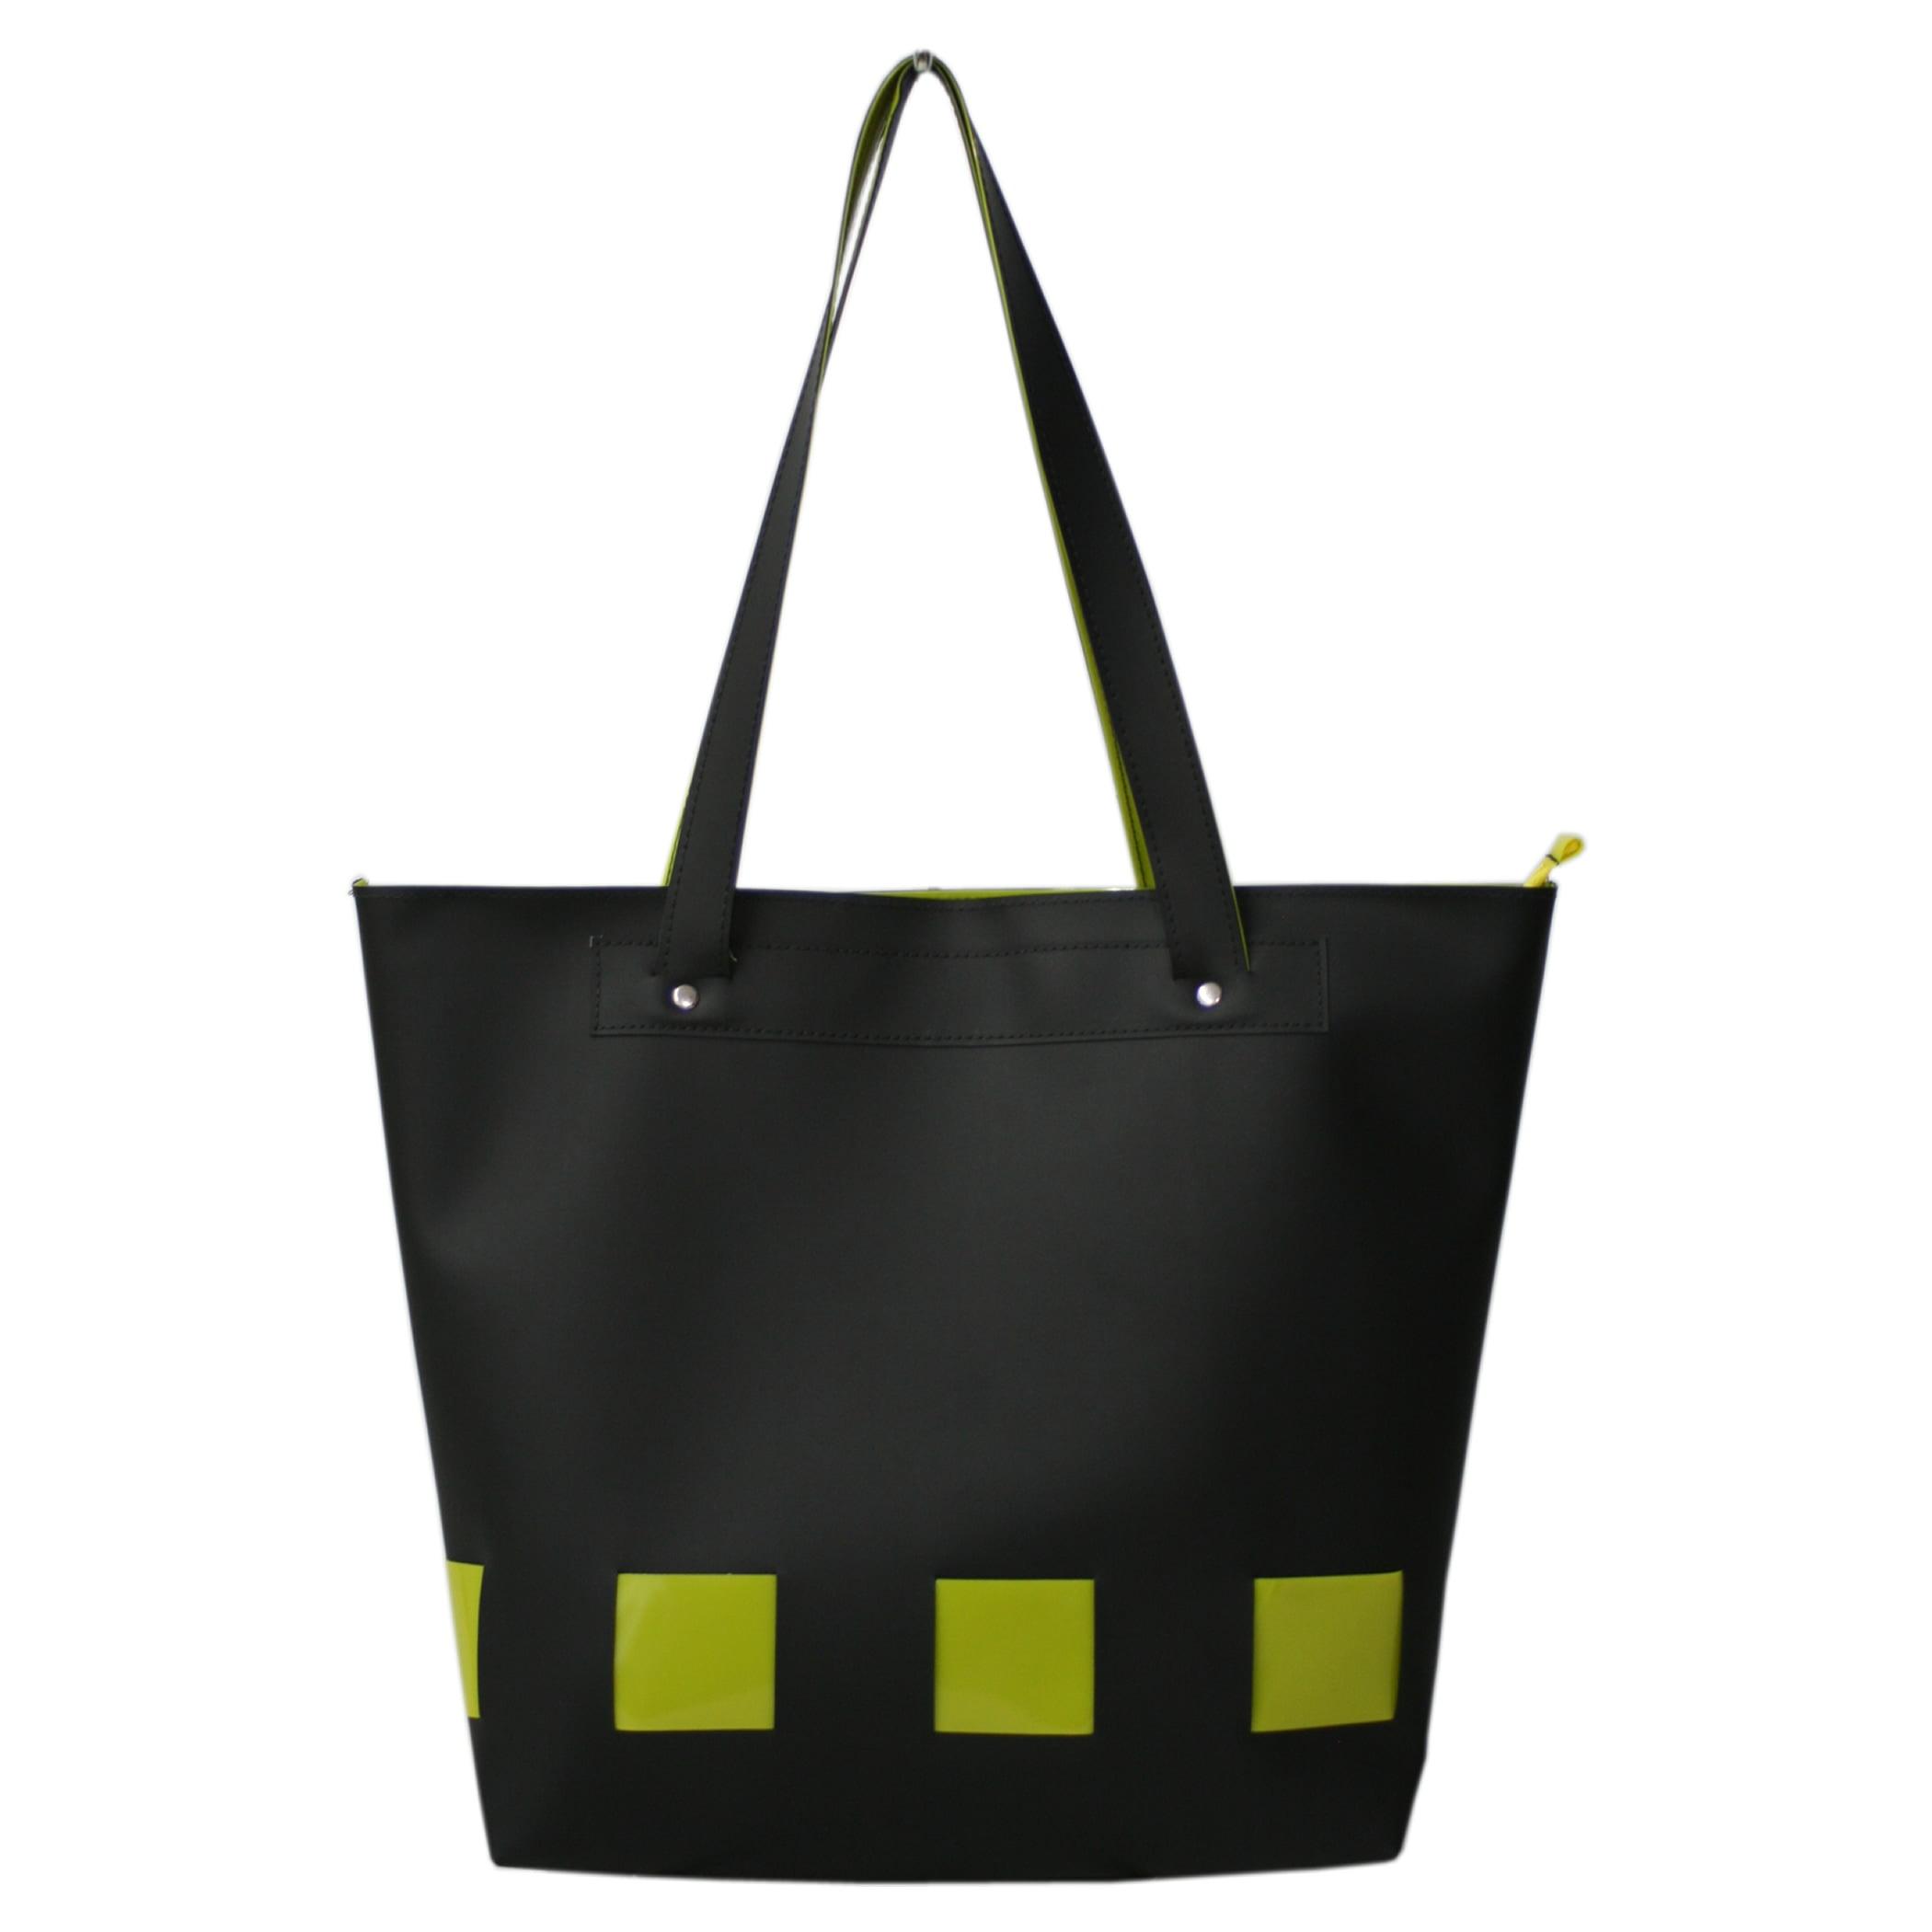 Bolsa de praia Preta e amarela Sitonia